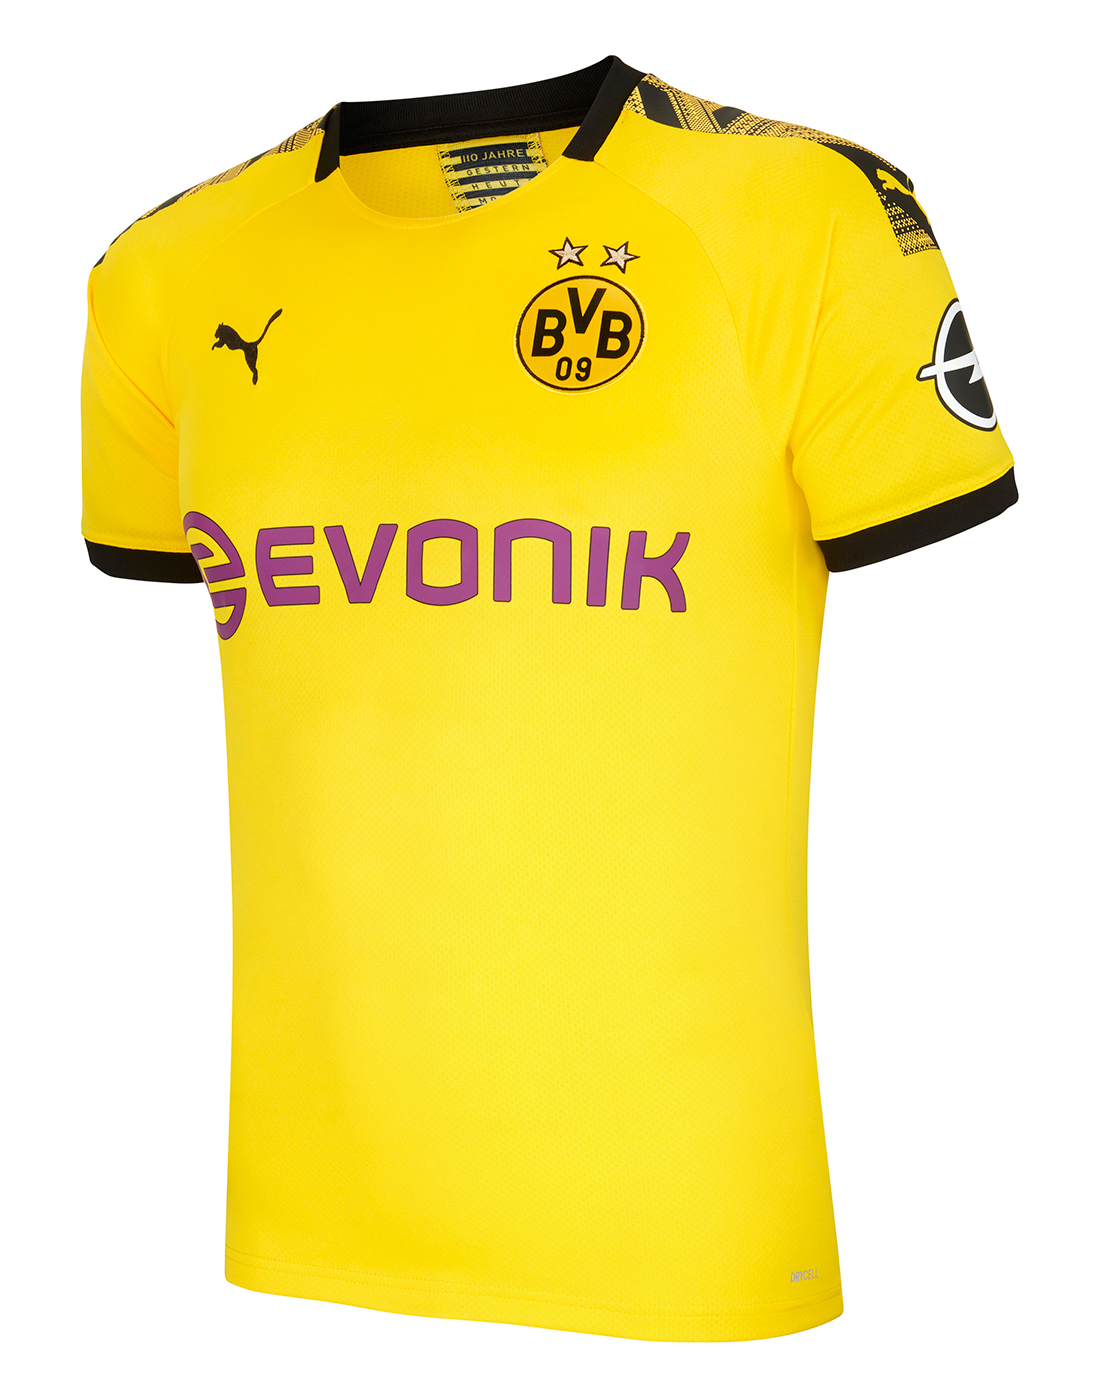 BVB Dortmund 19/20 Home Jersey | Life Style Sports